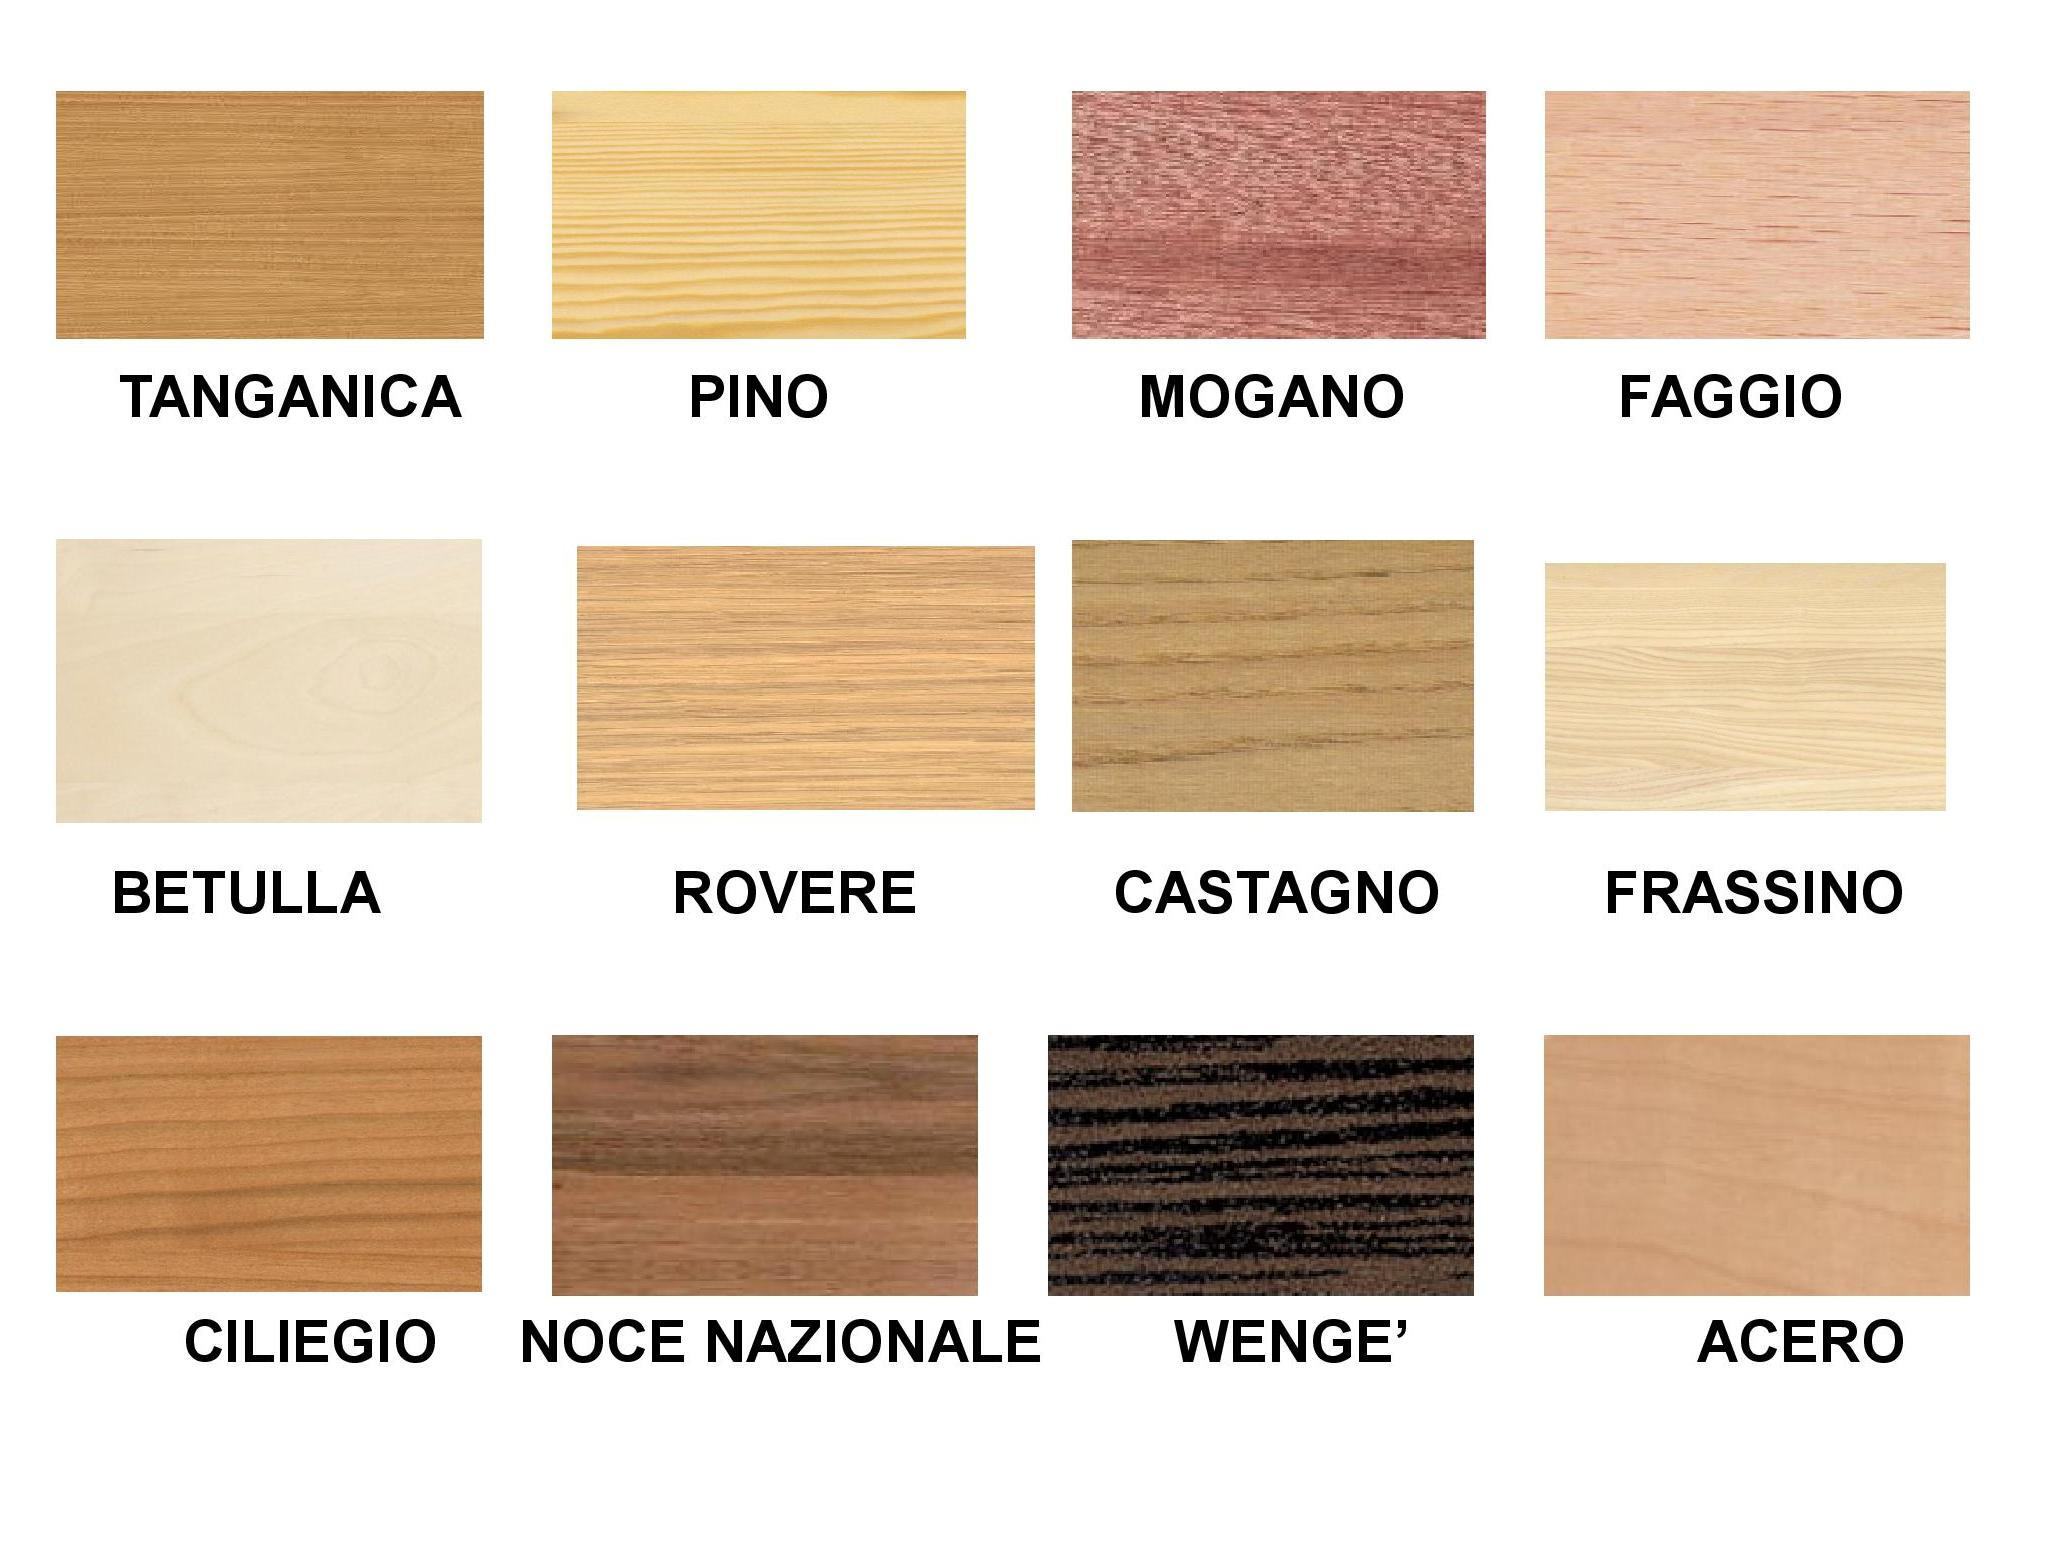 Squarcina essenze e guarnizioni squarcina - Tipi di legno per mobili ...